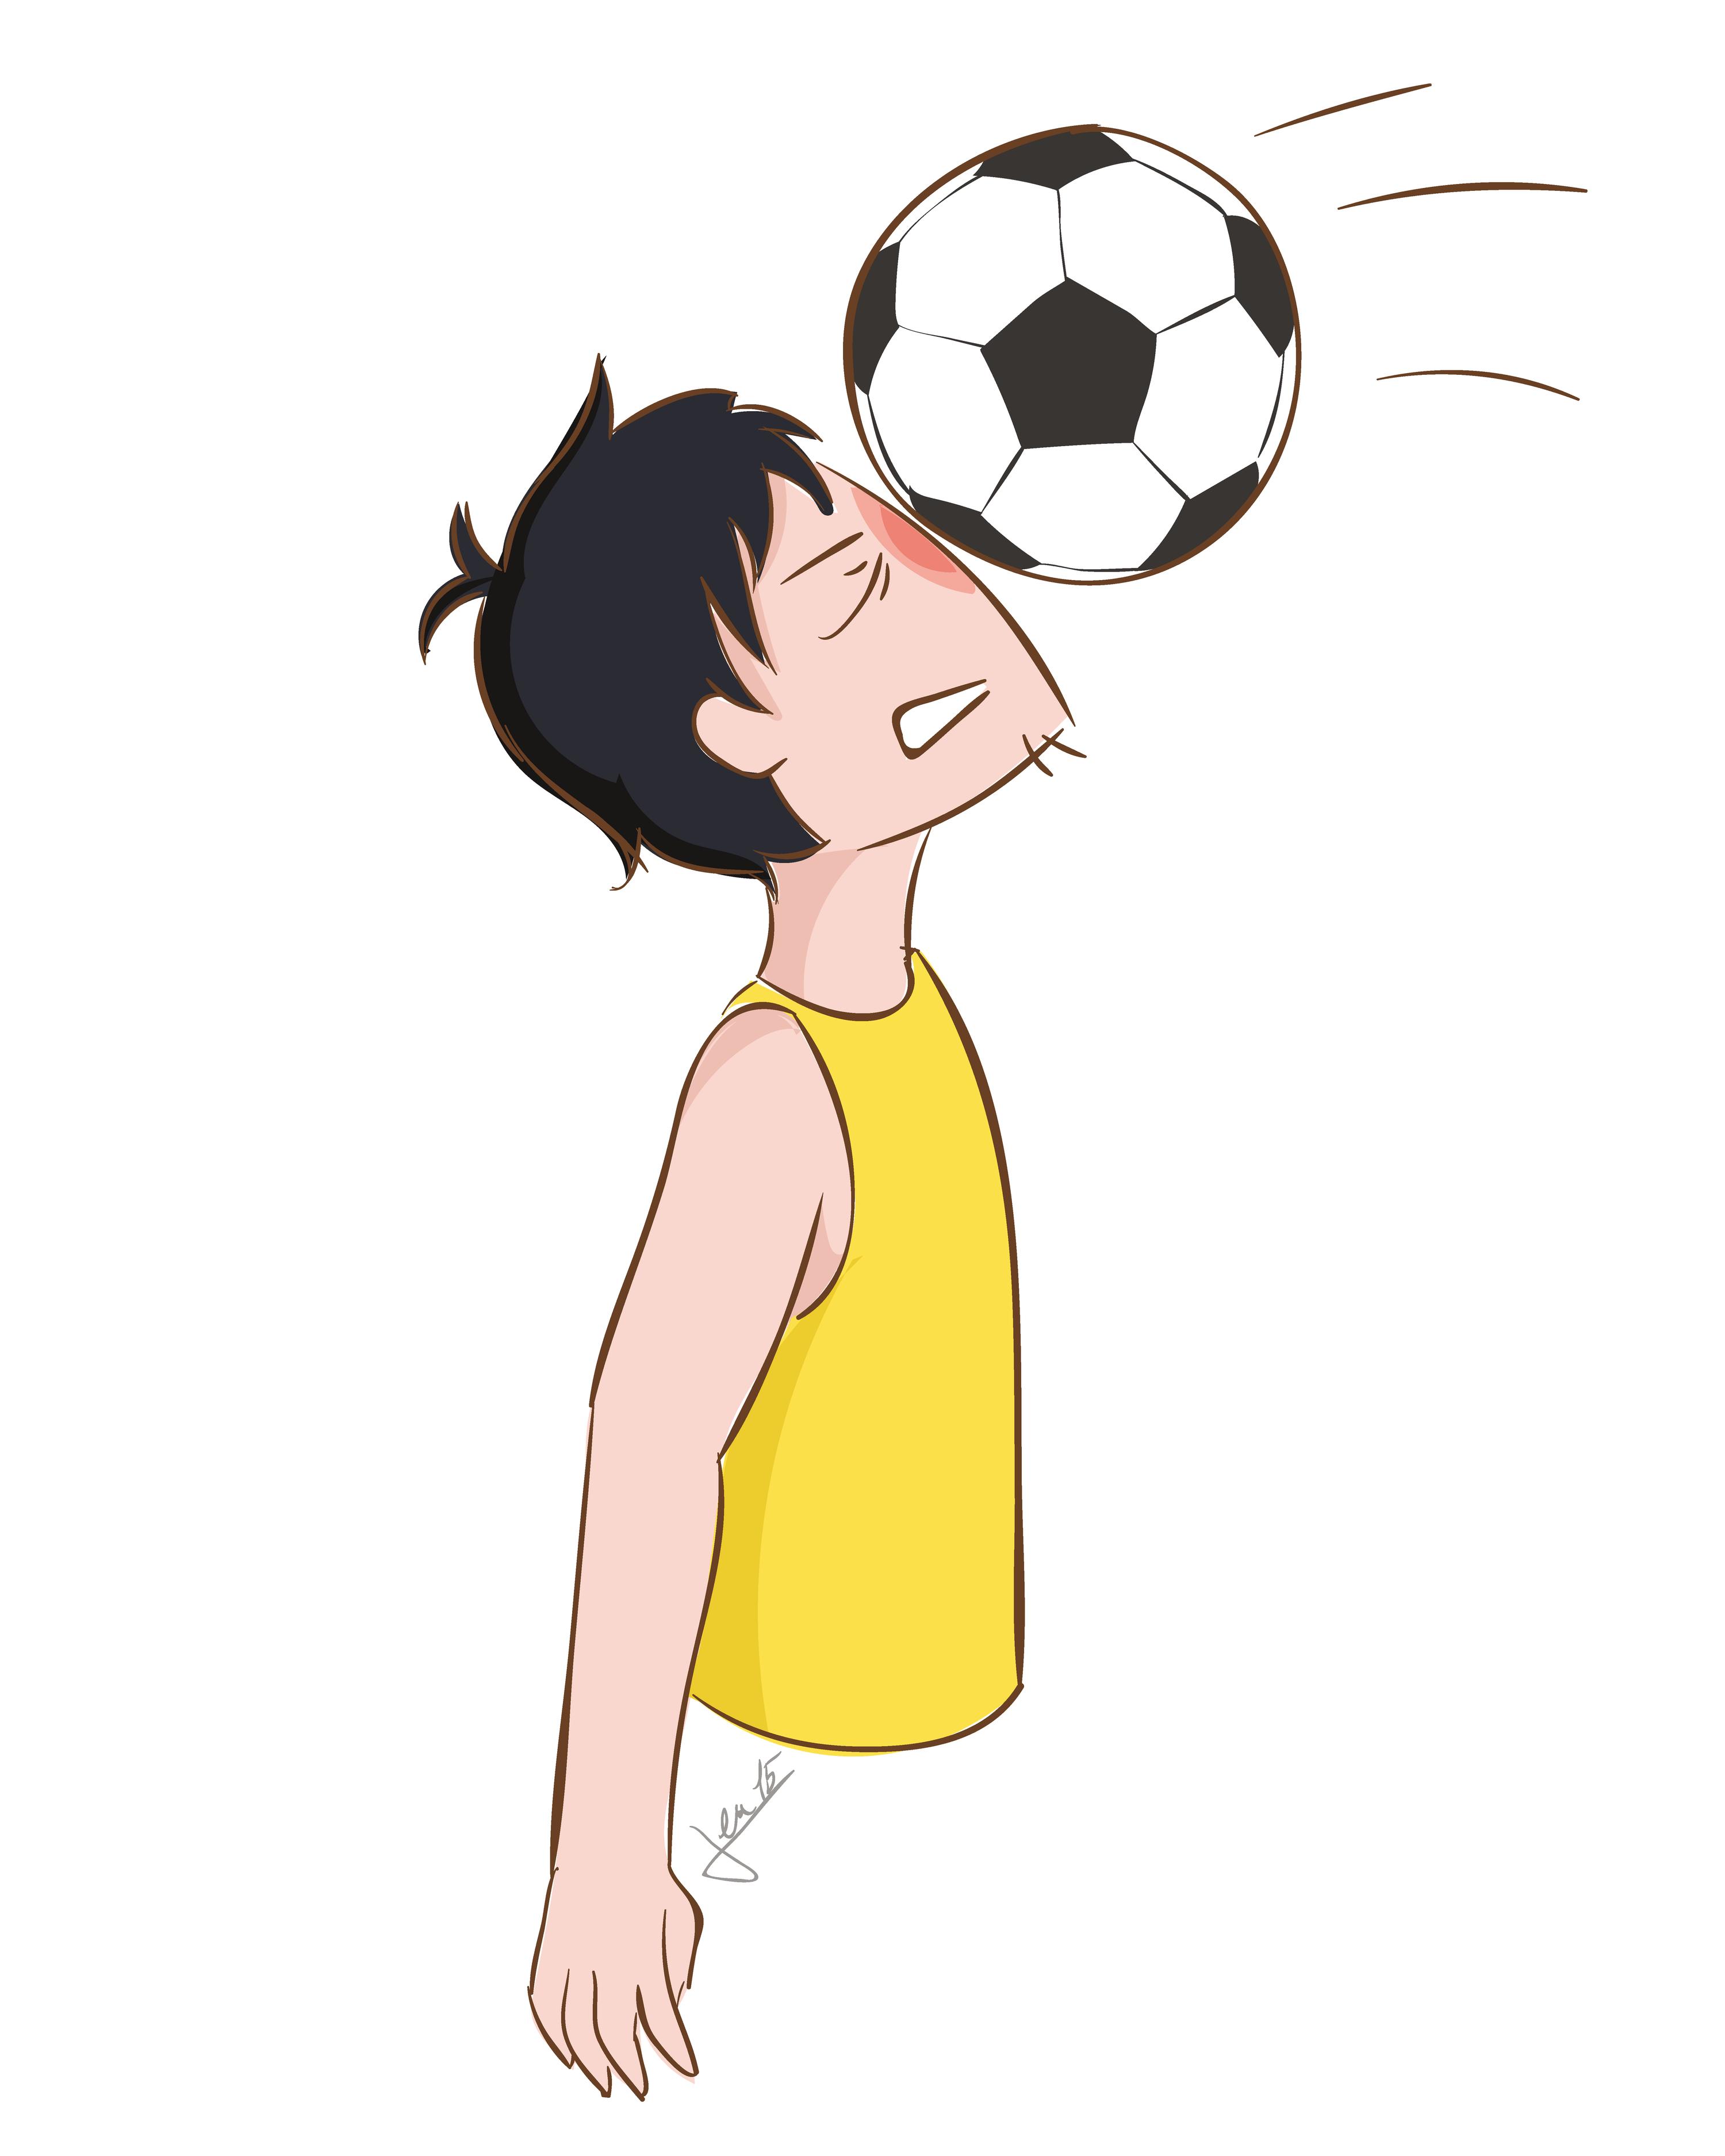 Ex. 1 Le football